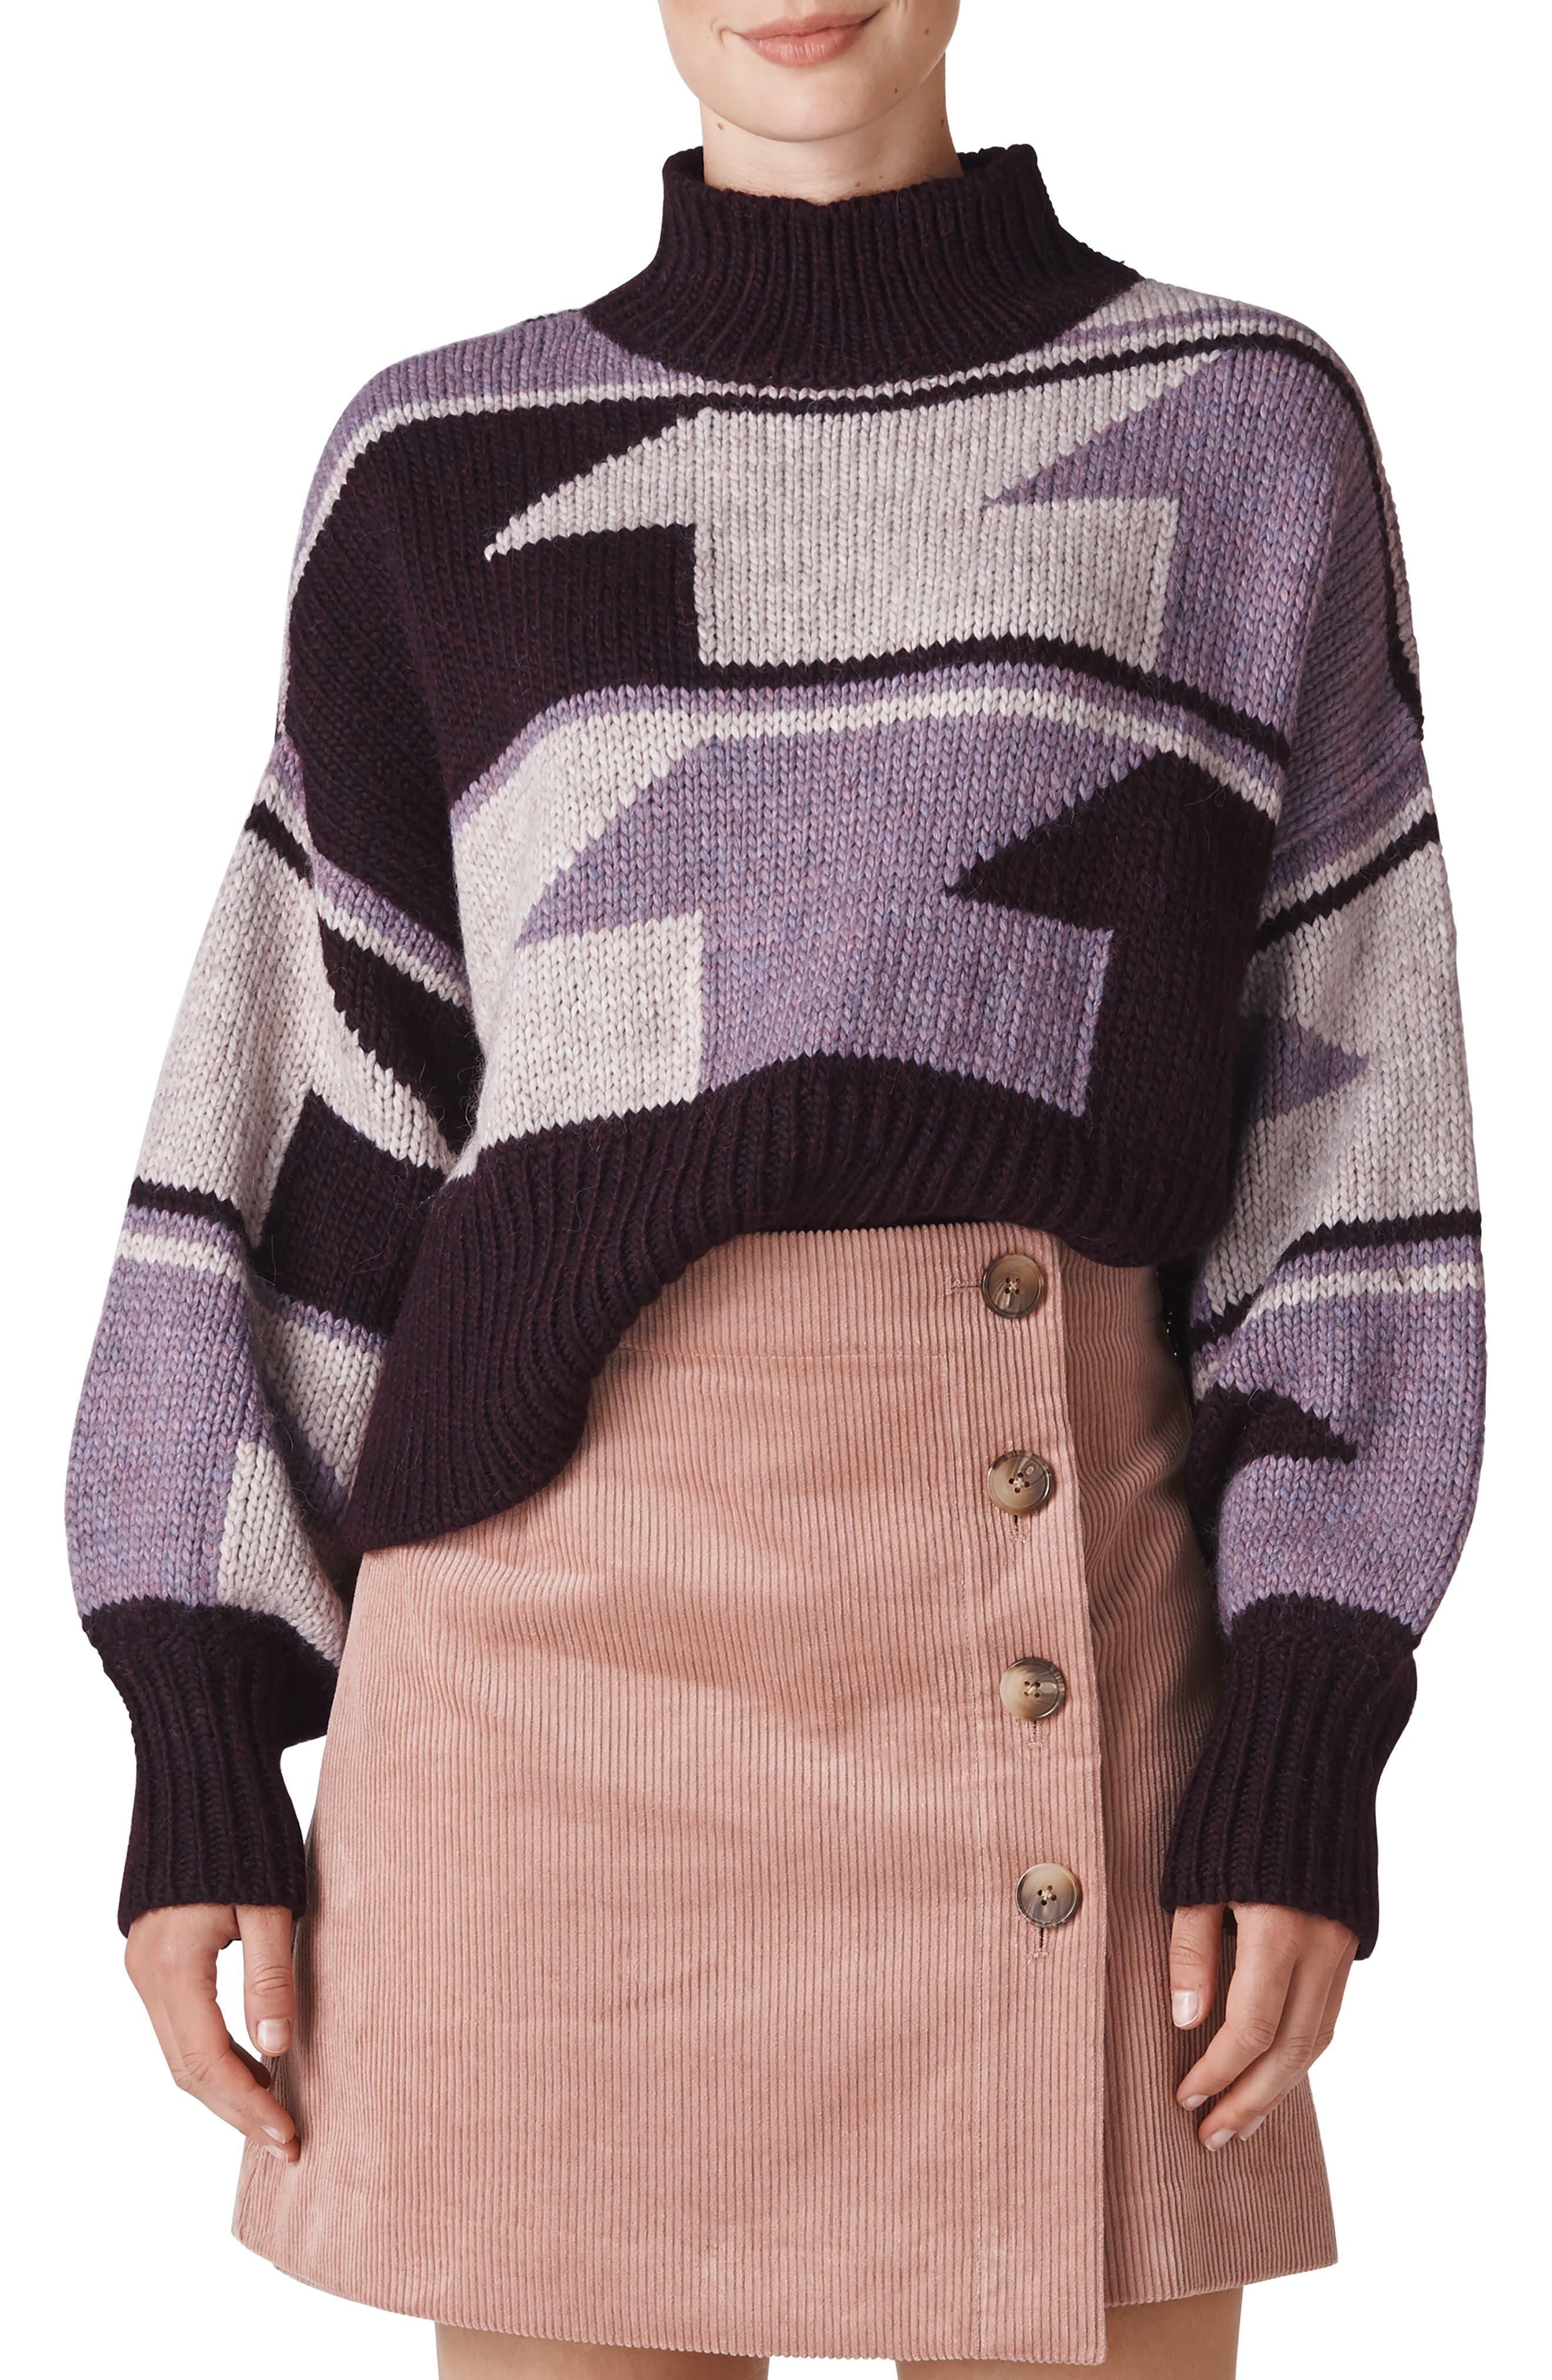 Intarsia Funnel Neck Sweater,                             Main thumbnail 1, color,                             500